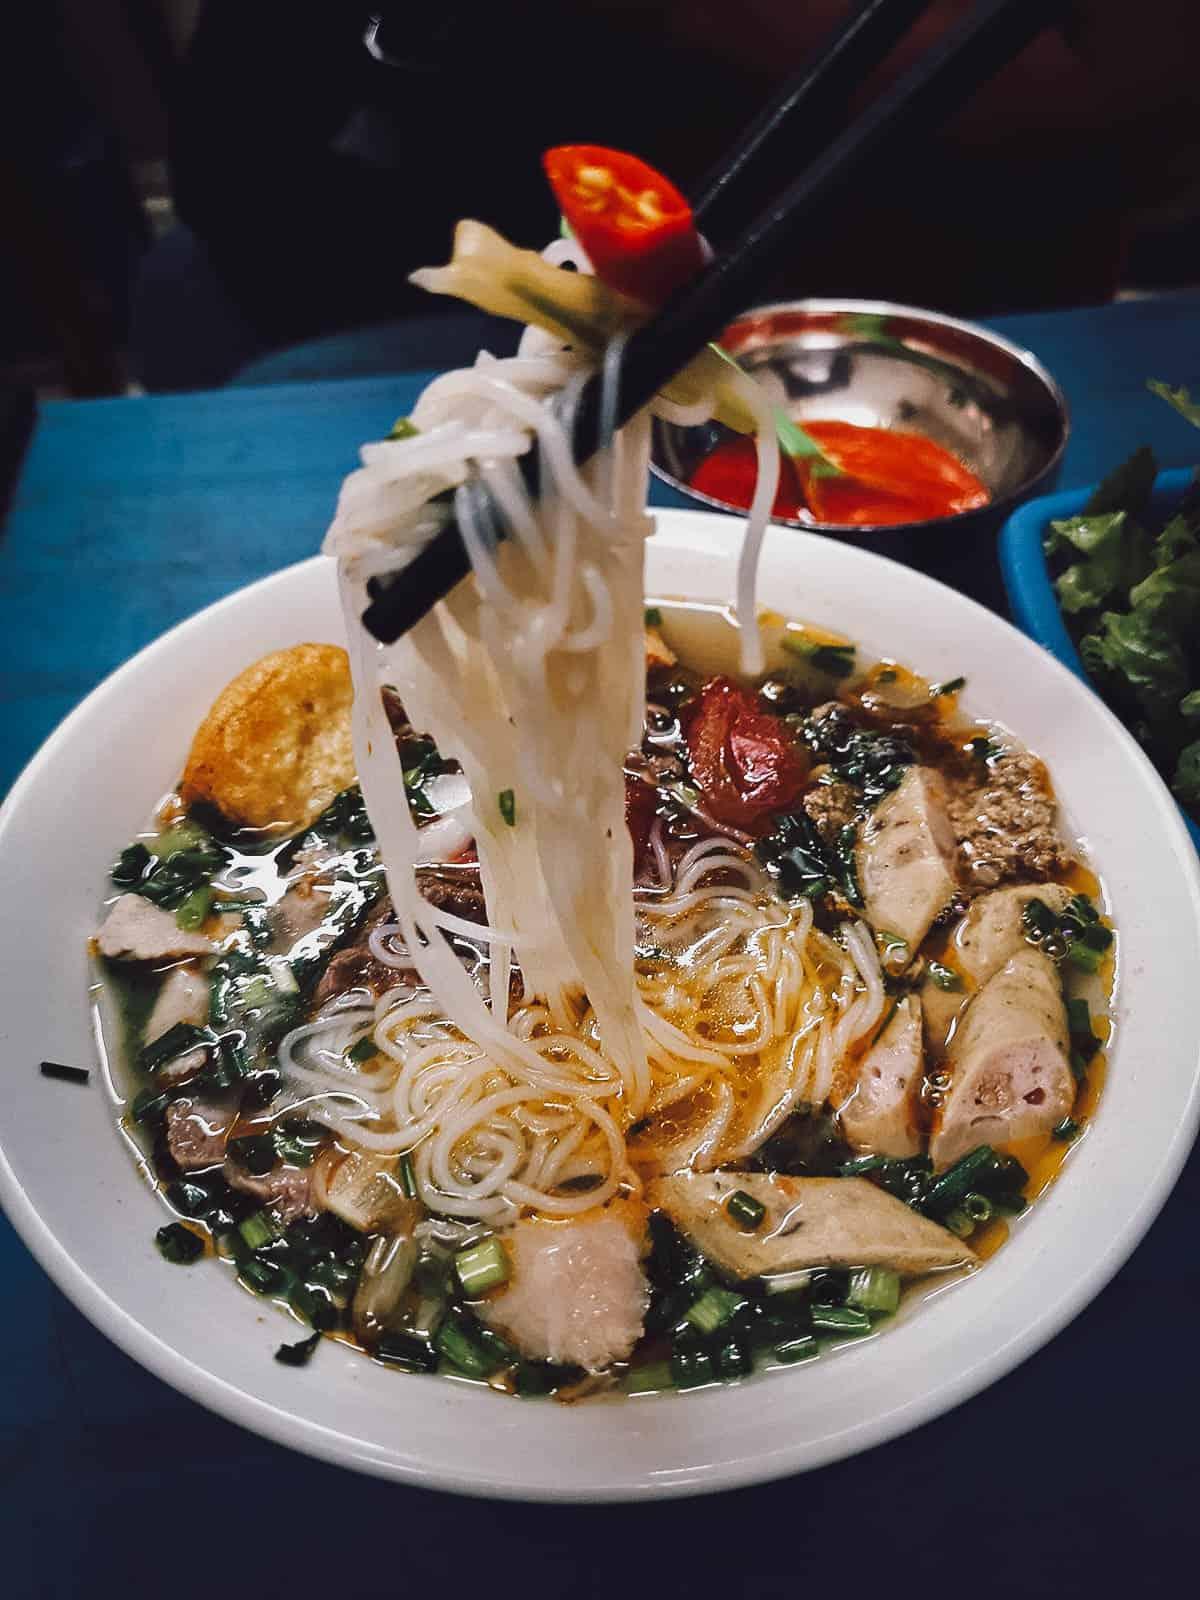 Bun rieu in Hanoi